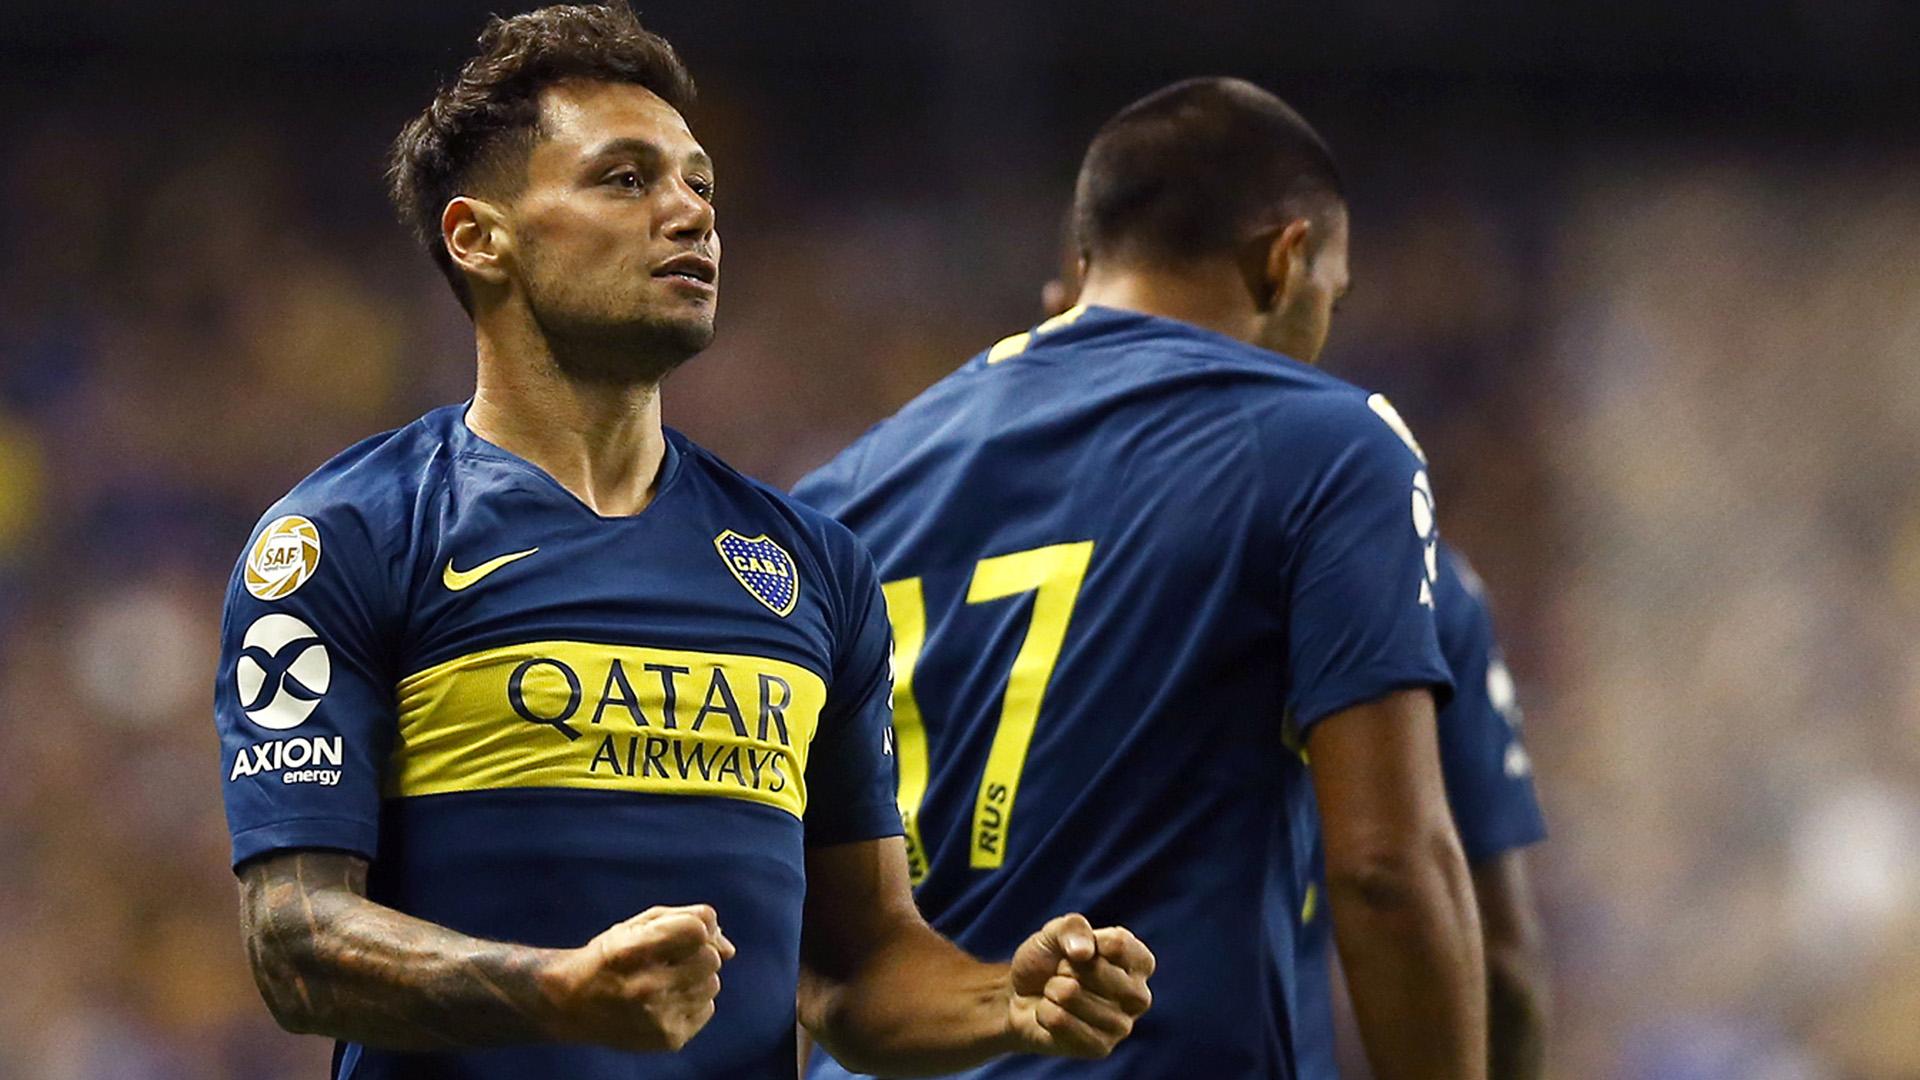 Mauro Zárate festeja el primer gol de Boca frente a San Lorenzo, el sábado en La Bombonera.